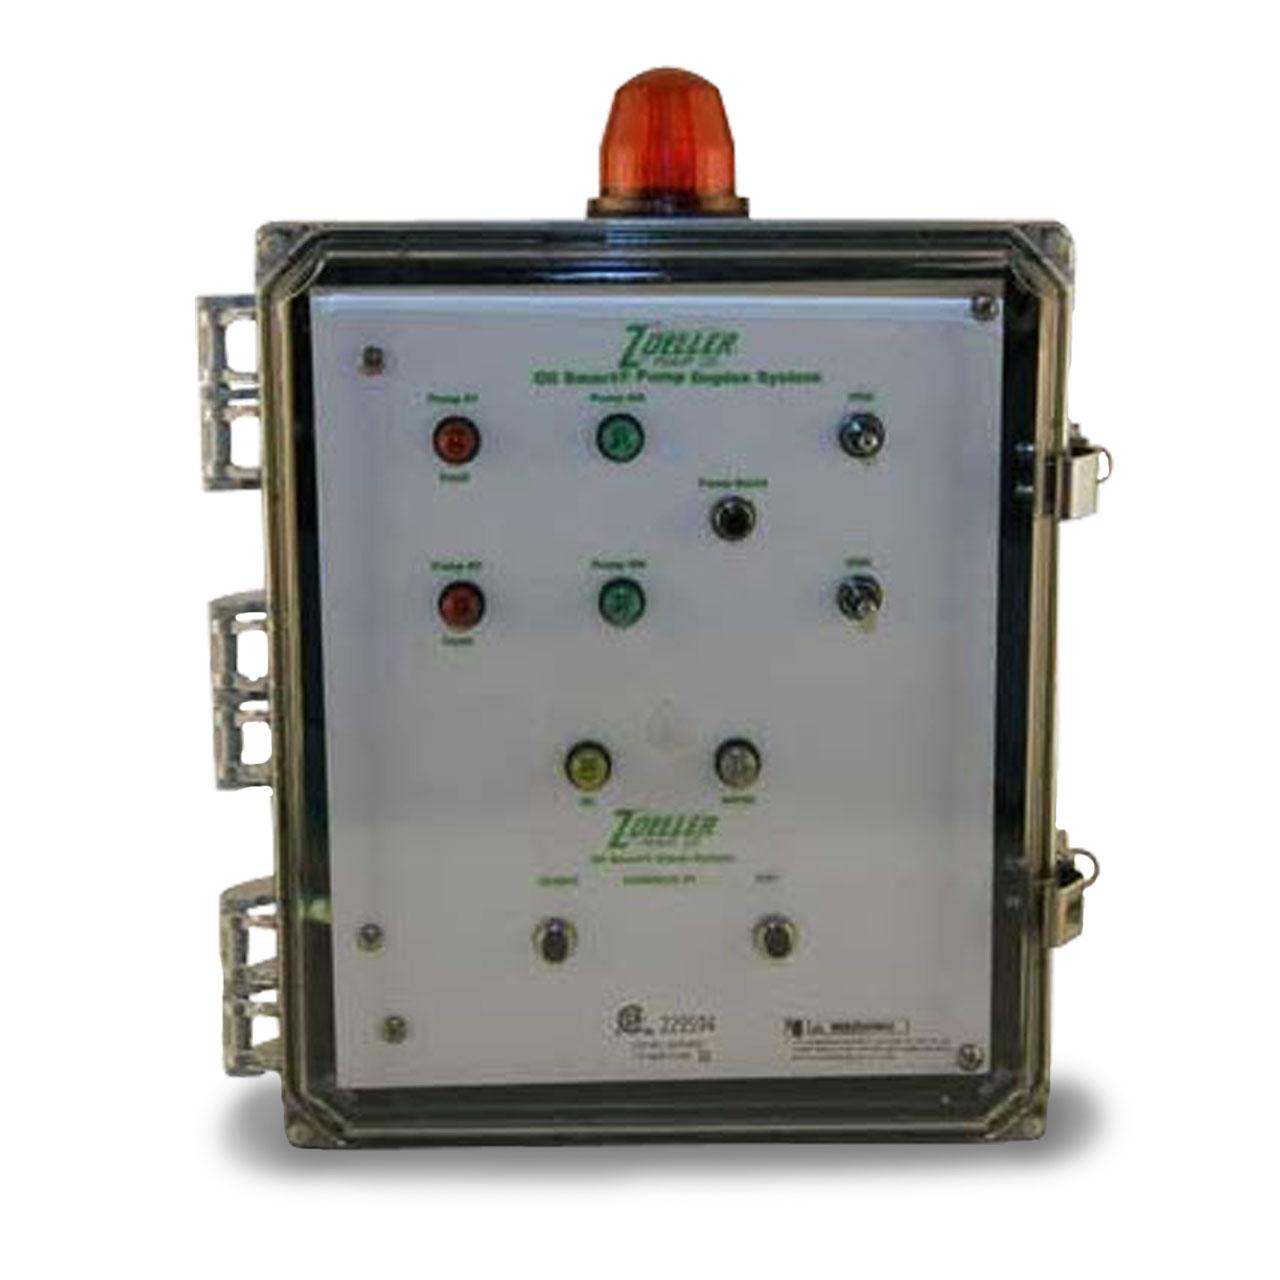 zoeller duplex pump control panel wiring diagram et m me 5 lettres great installation